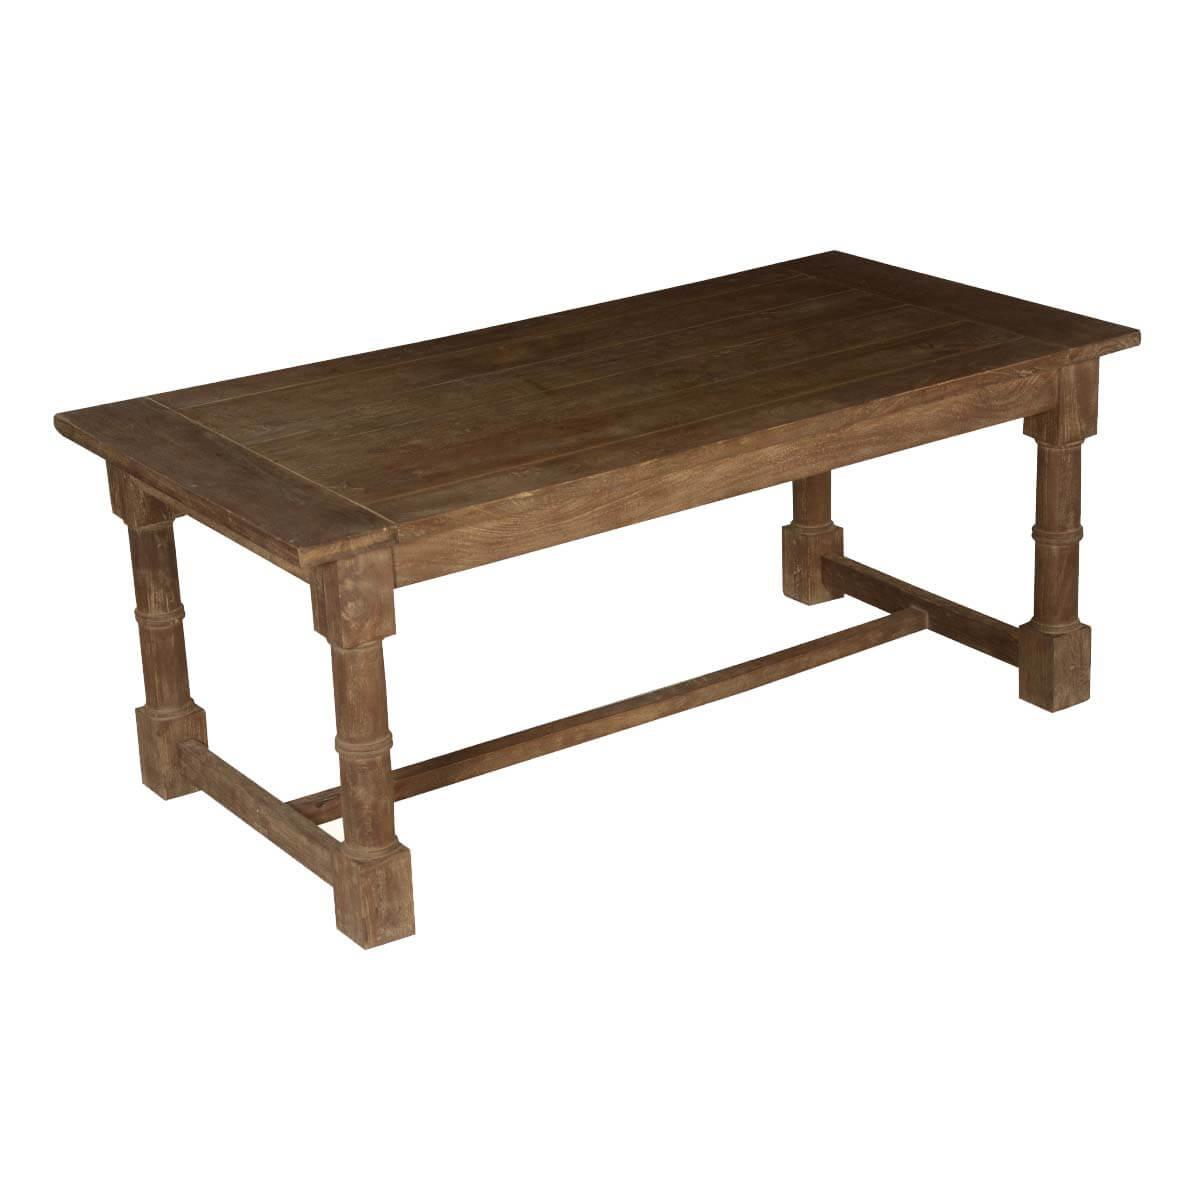 "Nottingham Rustic Mango Wood Gothic 72"" Dining Table"